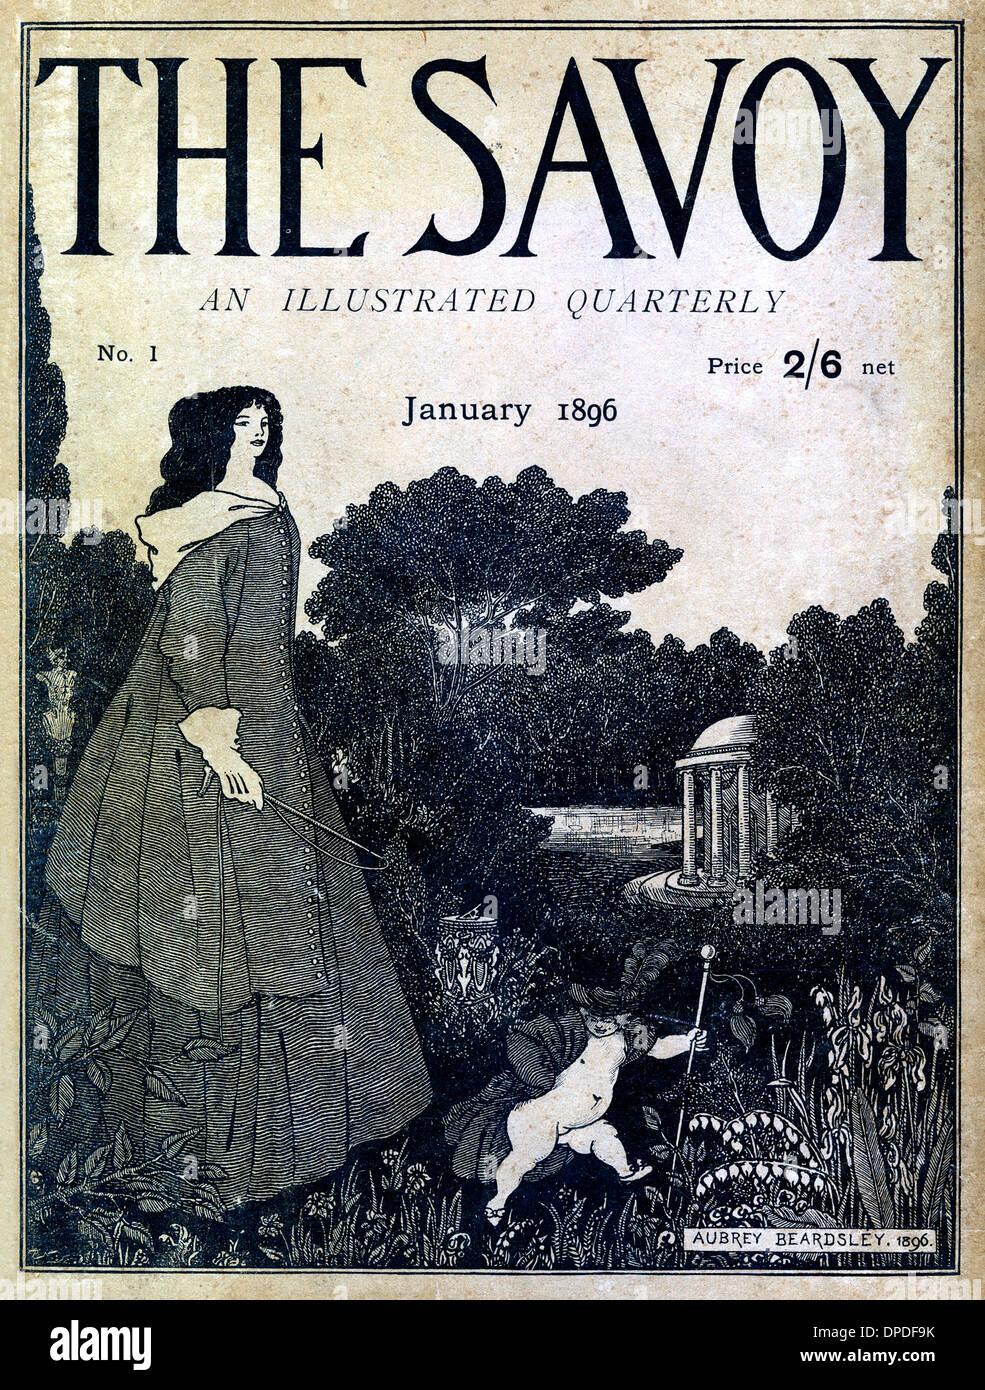 The Savoy Magazine, volume 1 - Stock Image